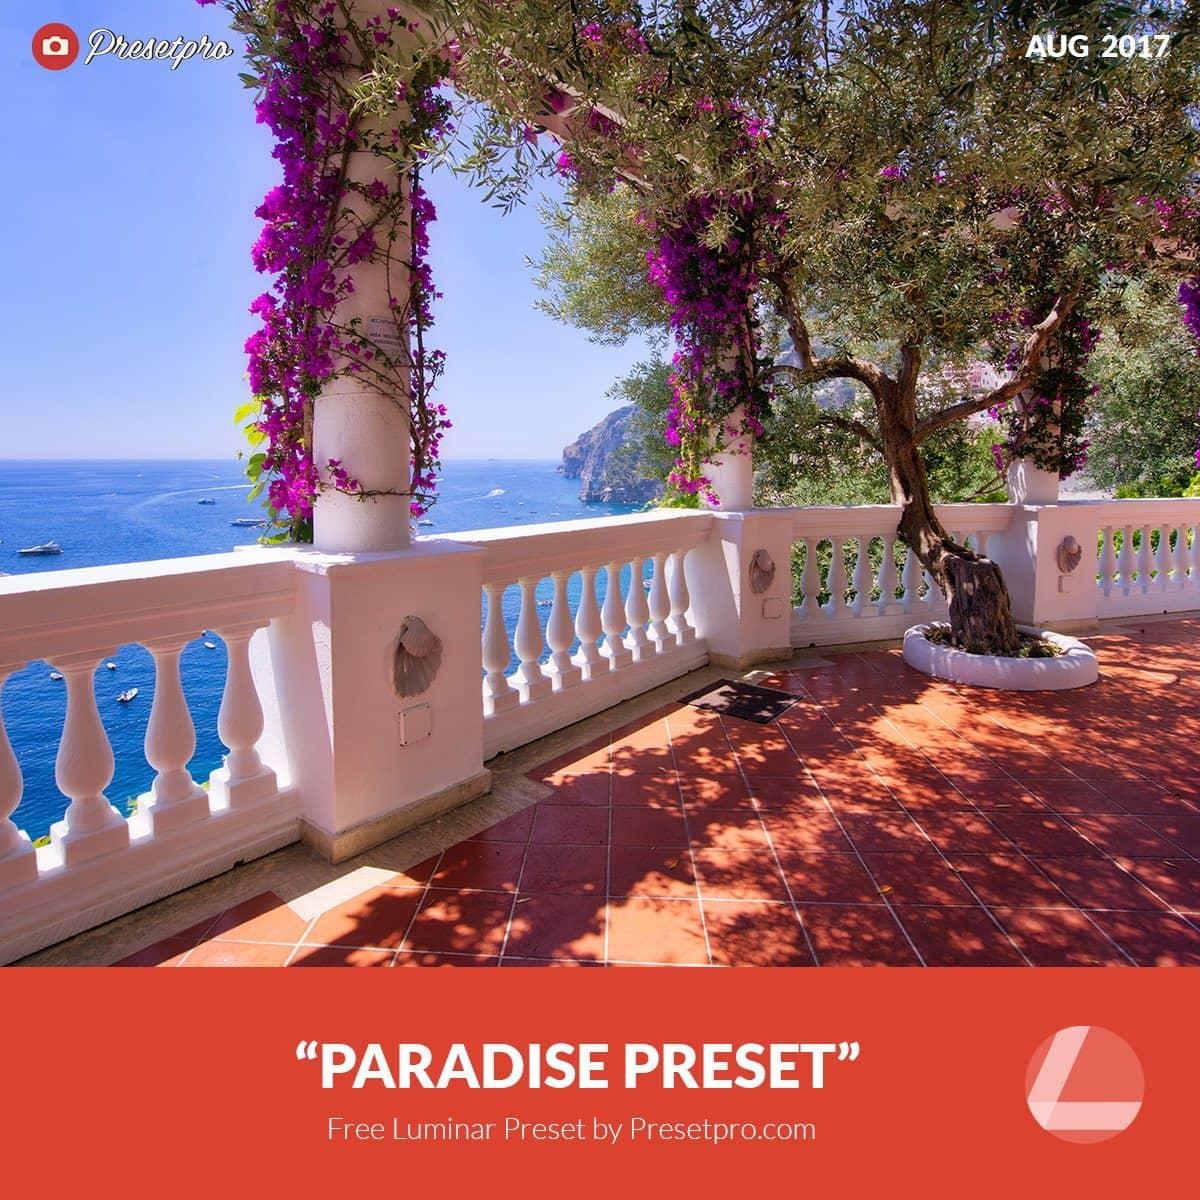 Free-Luminar-Preset-Paradise-Presetpro.com